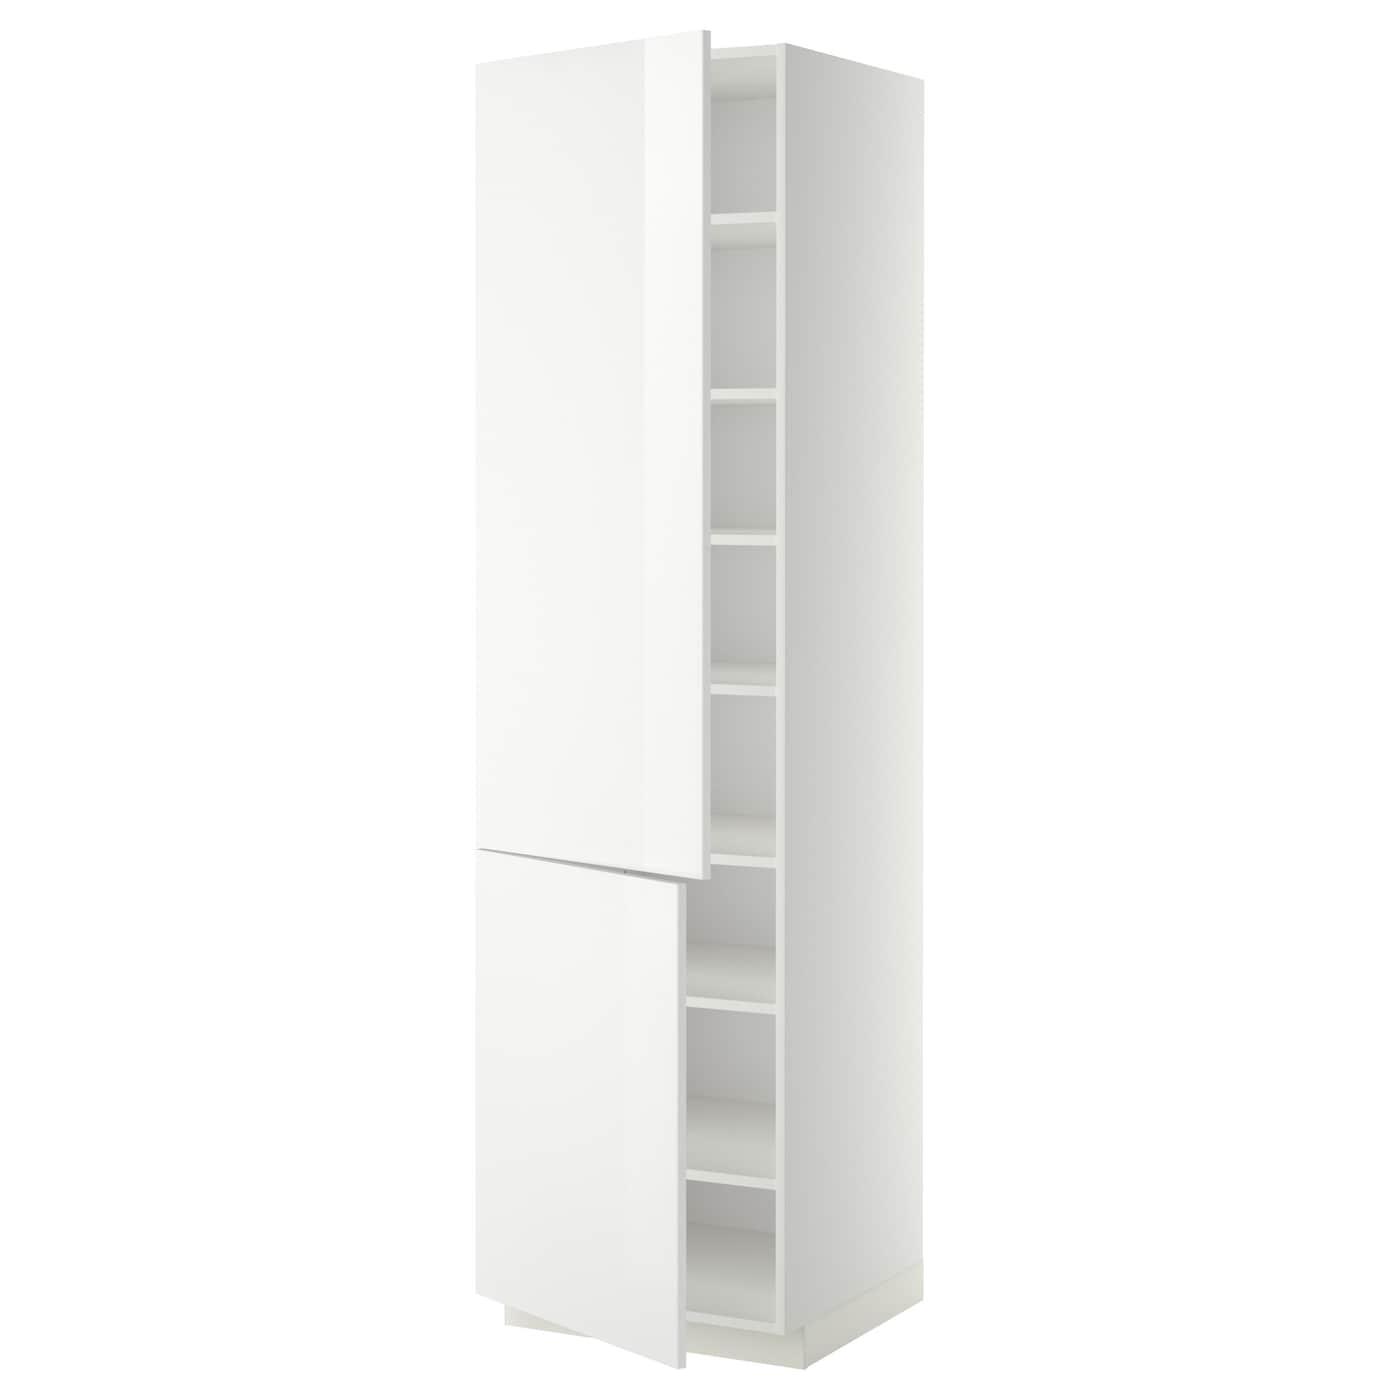 metod l ht tablette 2ptes blanc ringhult blanc 60x60x220 cm ikea. Black Bedroom Furniture Sets. Home Design Ideas